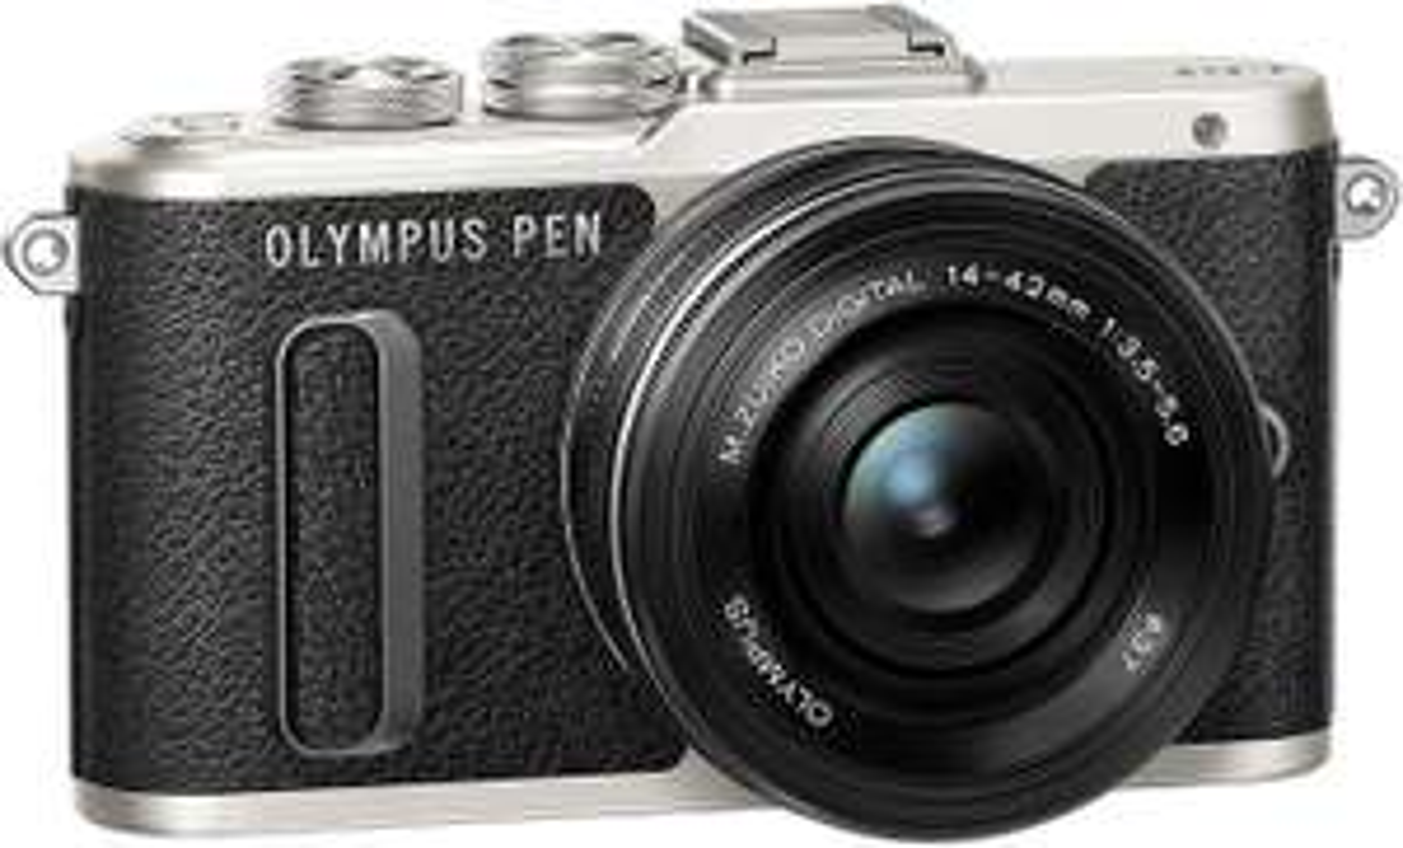 "Systemkamera Olympus Pen E-PL8 14-42 mm Kit (Micro-Four-Thirds, 16MP, 3"" Touchscreen, Blitzschuh, 3D-Fotos, 1080p30, SD, HDMI, USB, WLAN)"